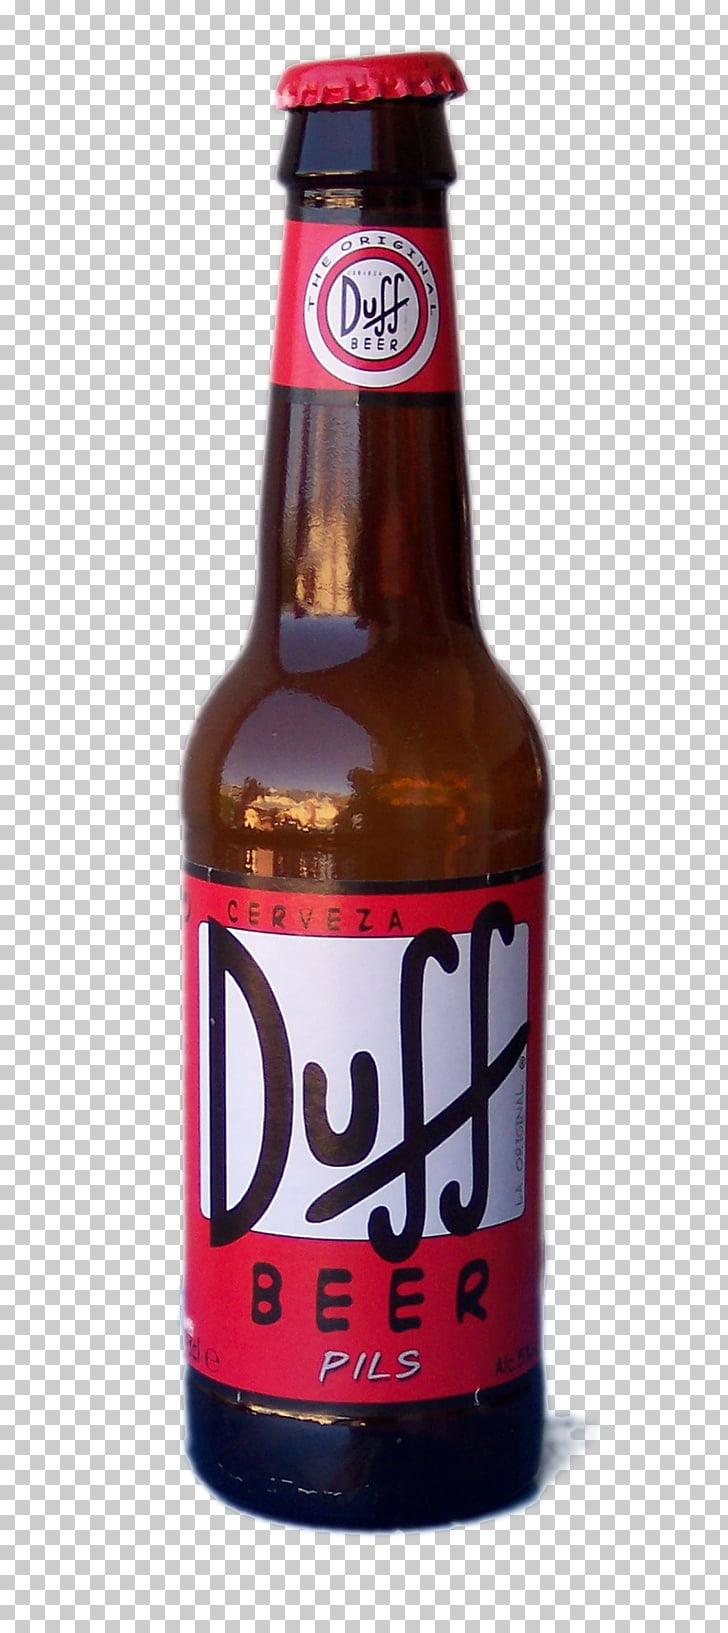 Duff Beer Budweiser Beer bottle, Bottle , free of bottle.